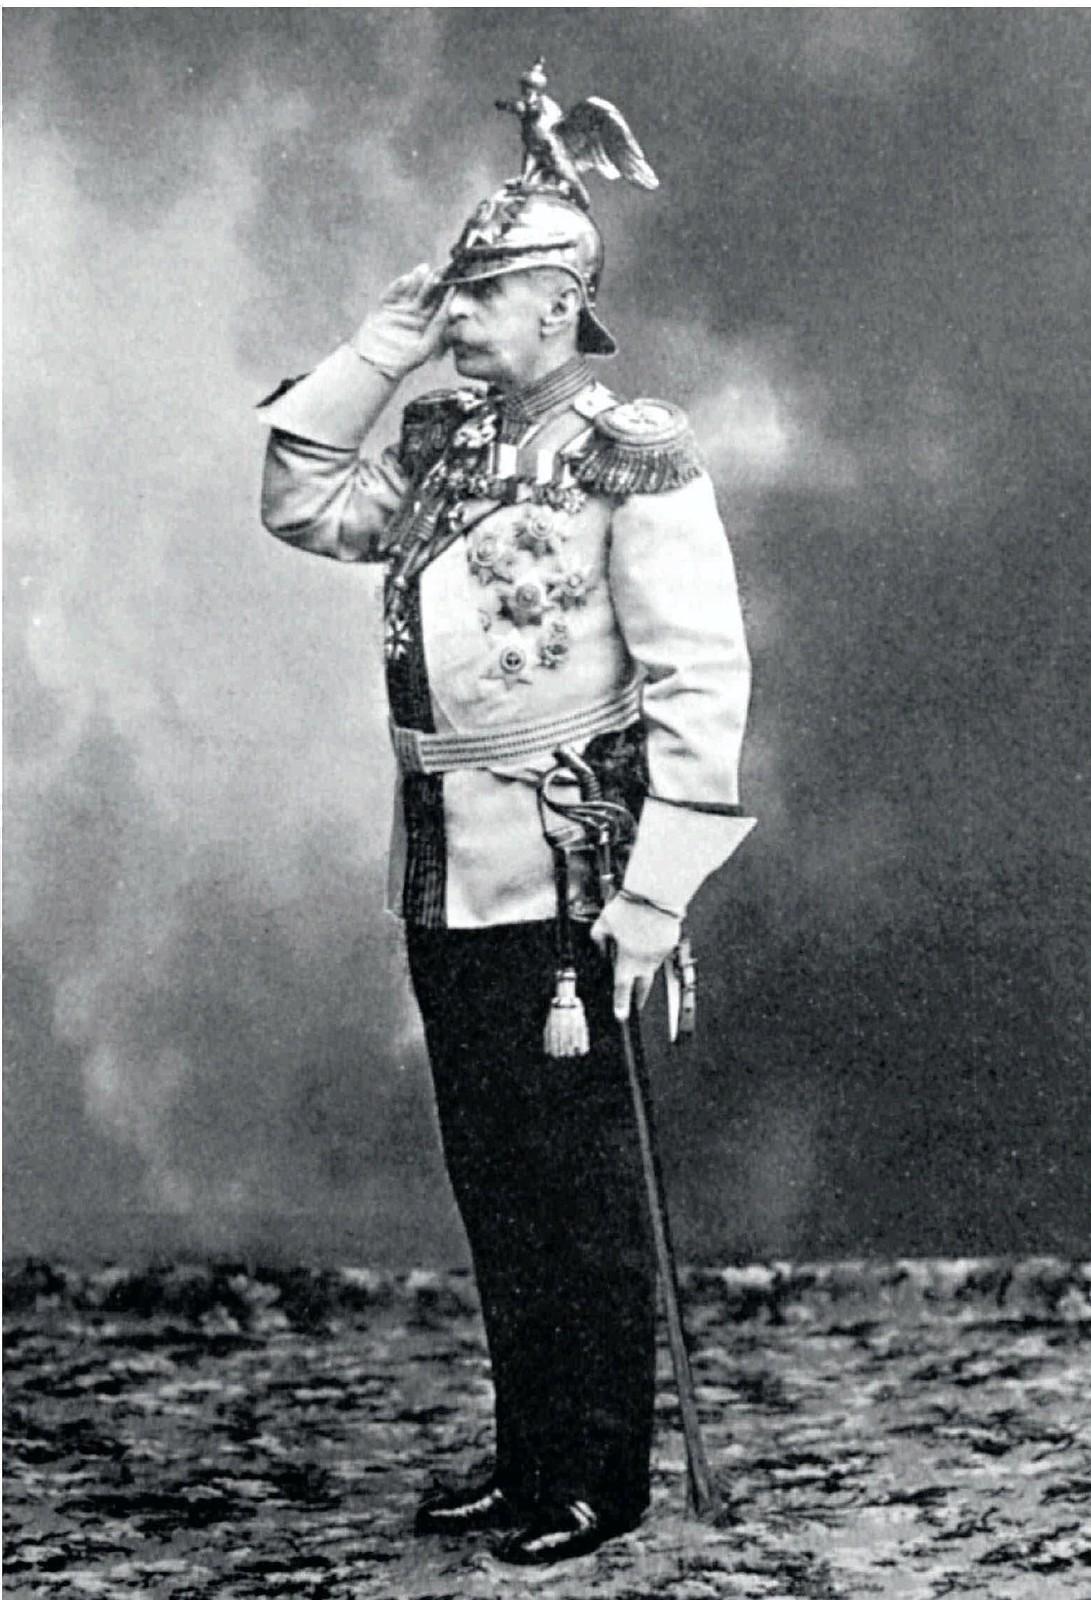 1913. Министр Императорского двора и уделов граф Владимир Борисович Фредерикс